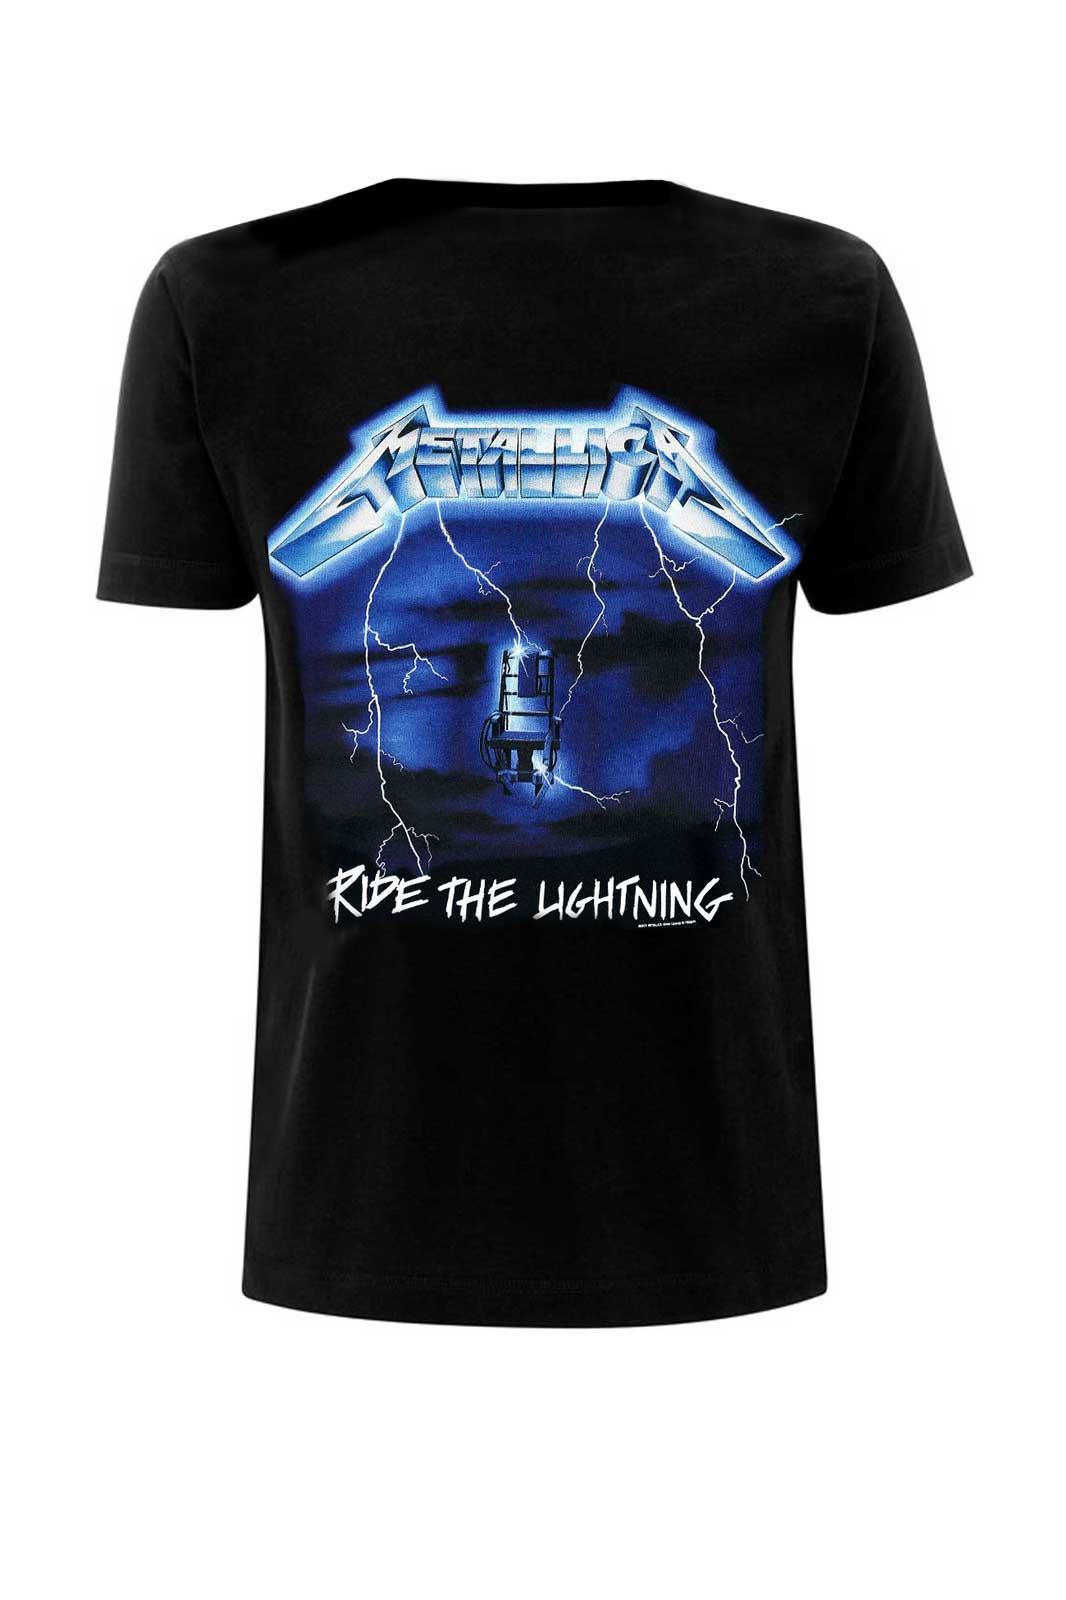 Unisex Tee Metallica Ride Blac